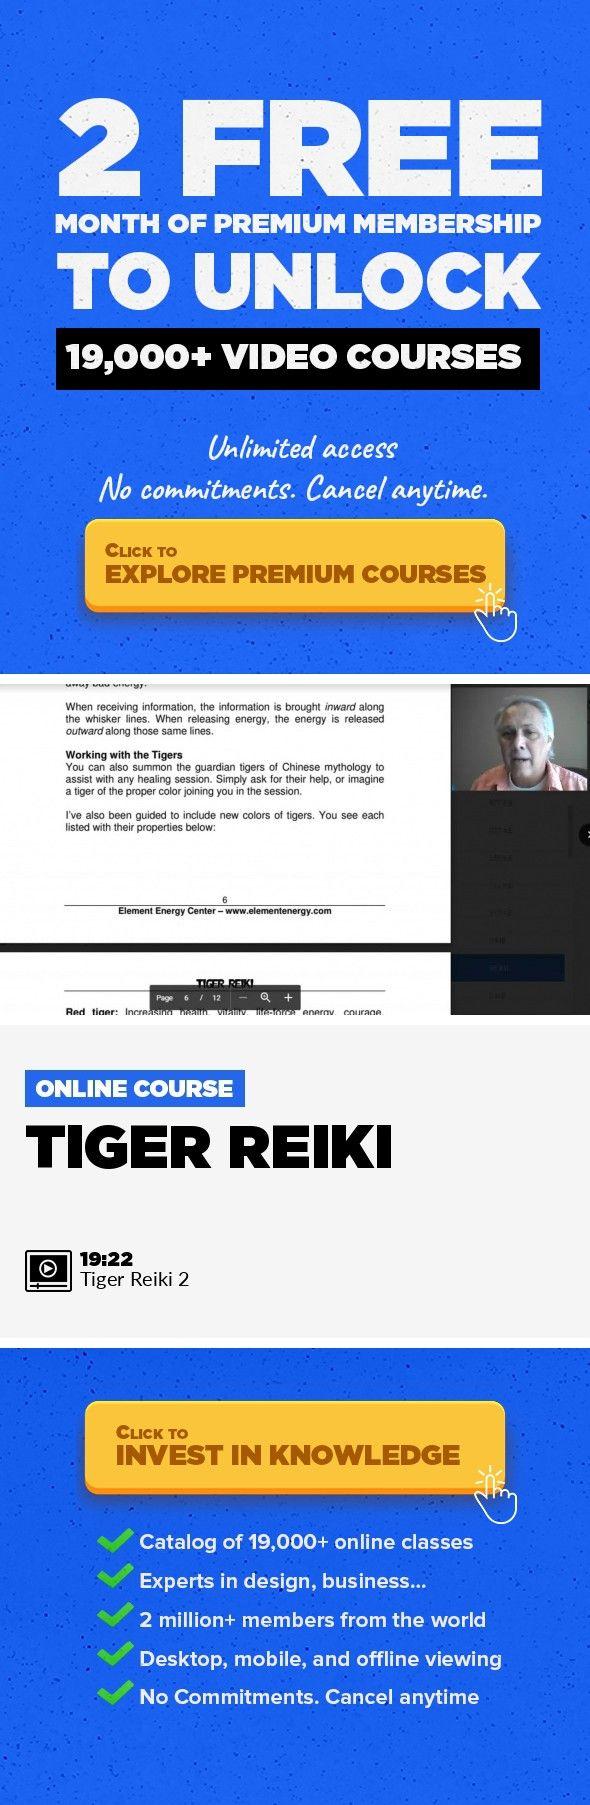 170 best online lessons internet safety images on pinterest tiger reiki health wellness lifestyle yoga meditation wellness reiki reikimaster onlinecourses createonlinecourses onlinebusinesstips according fandeluxe Choice Image